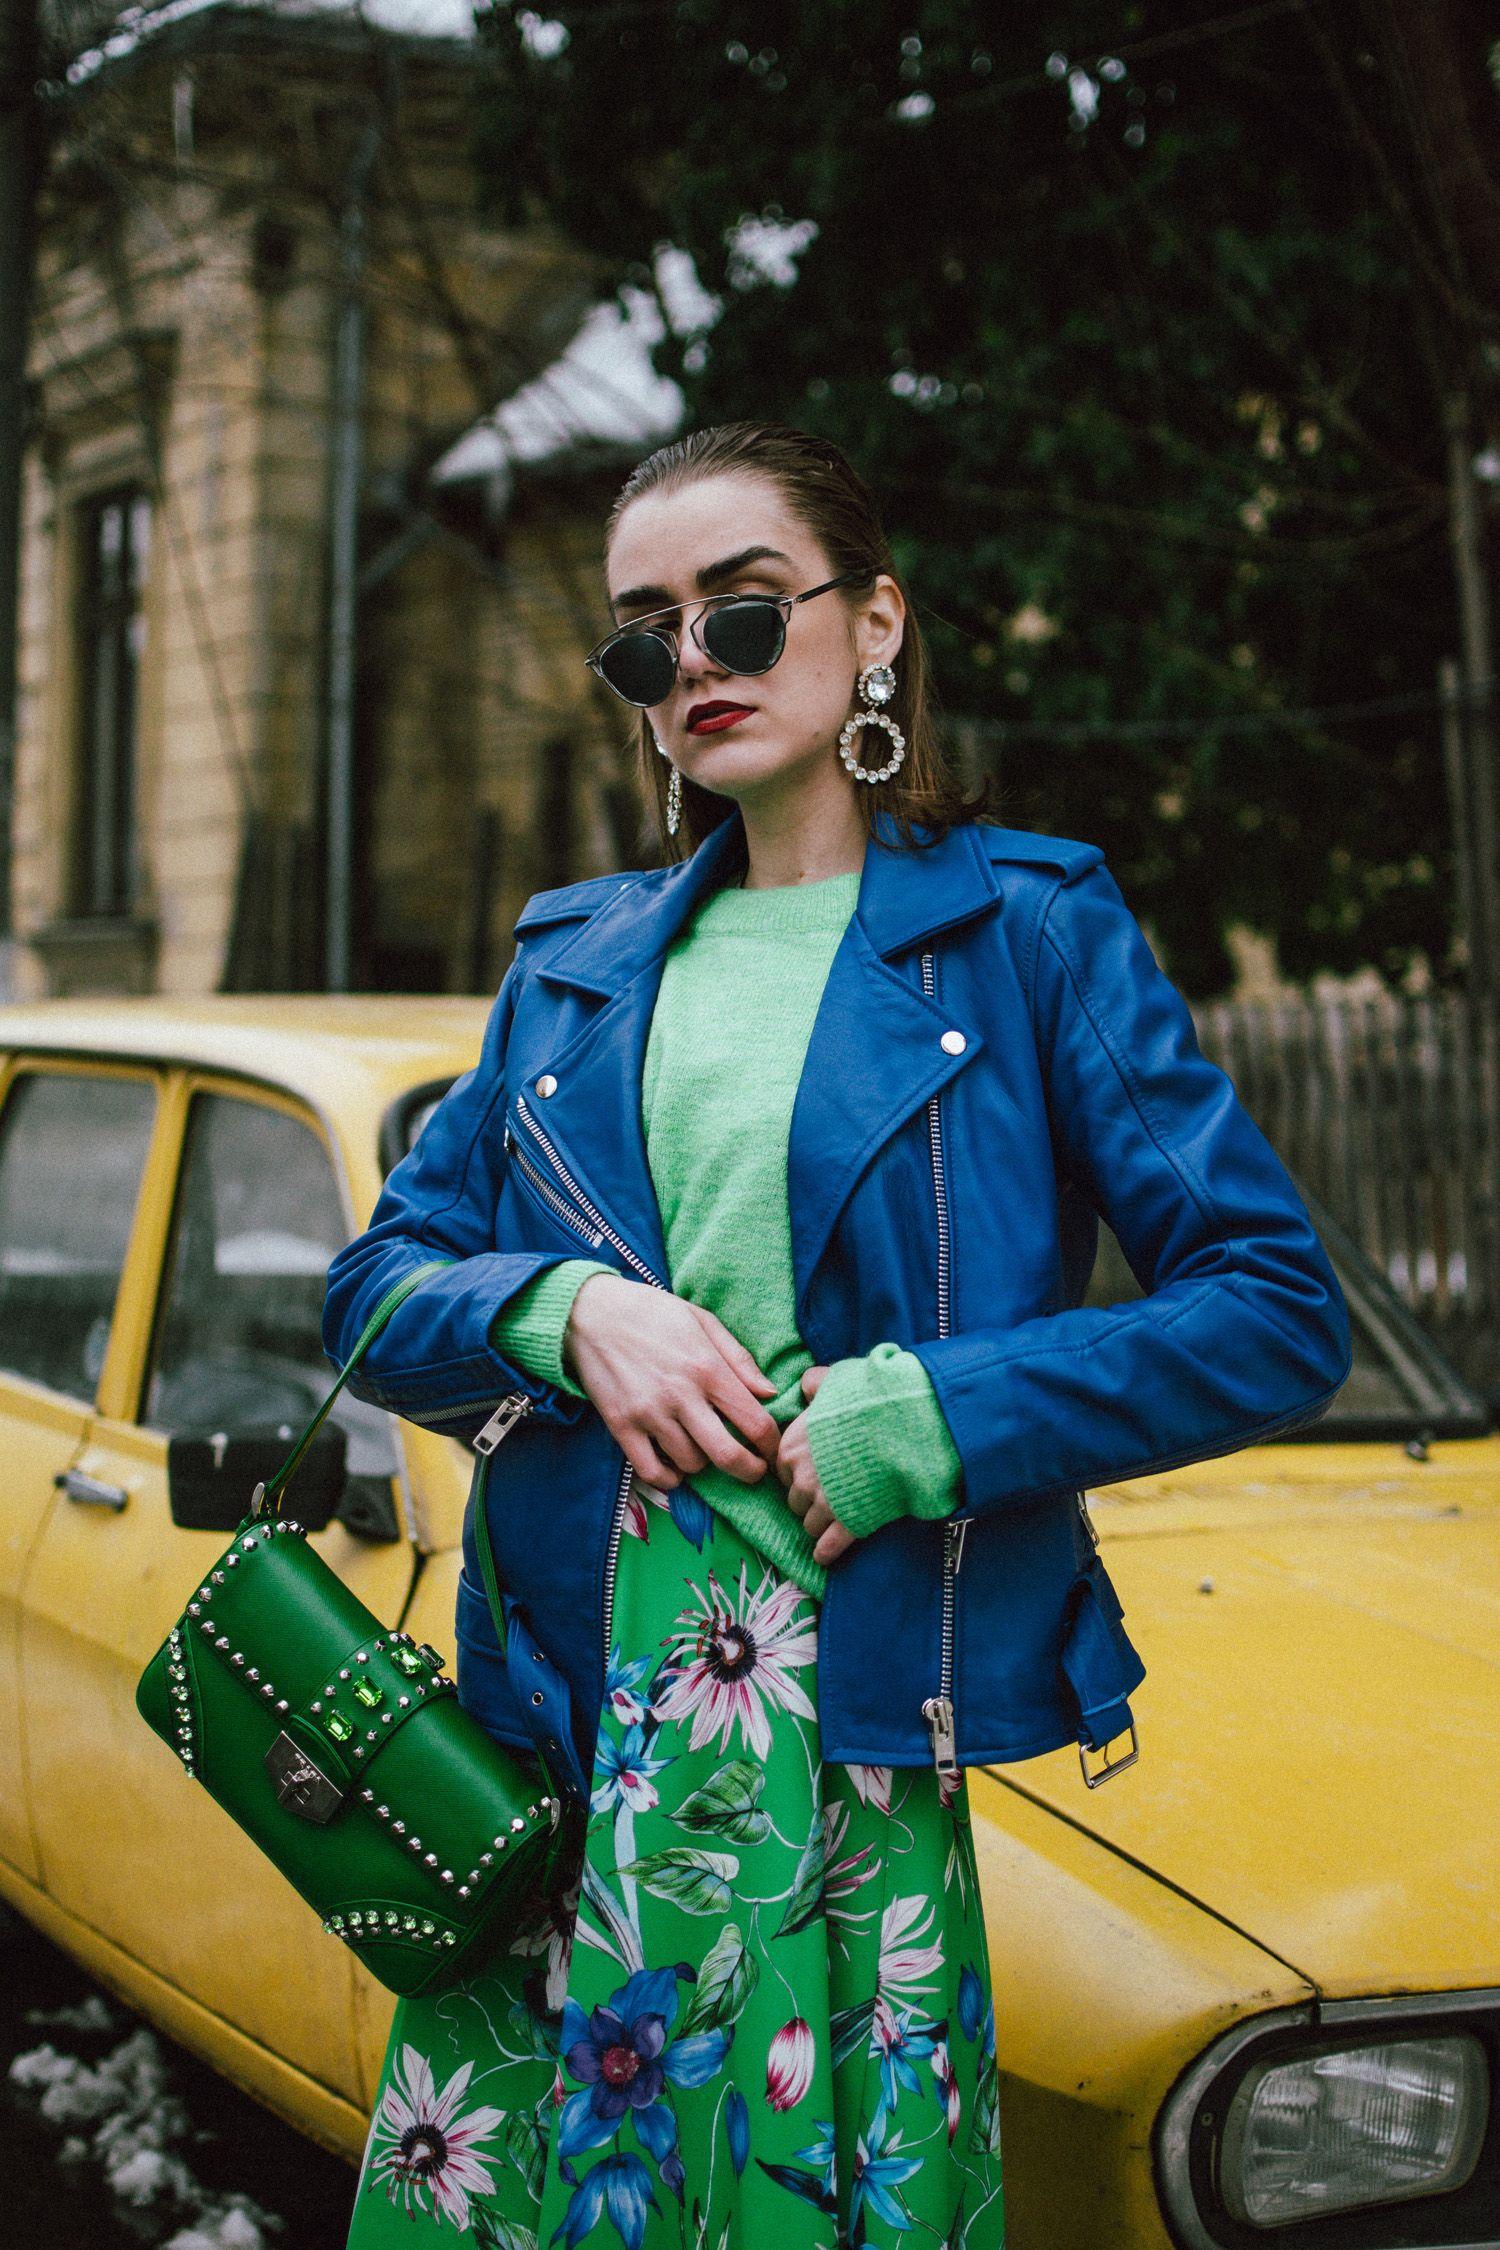 d738897f96e3f Blue leather jacket, green floral midi dress, sweater, dior sunglasses,  prada studded